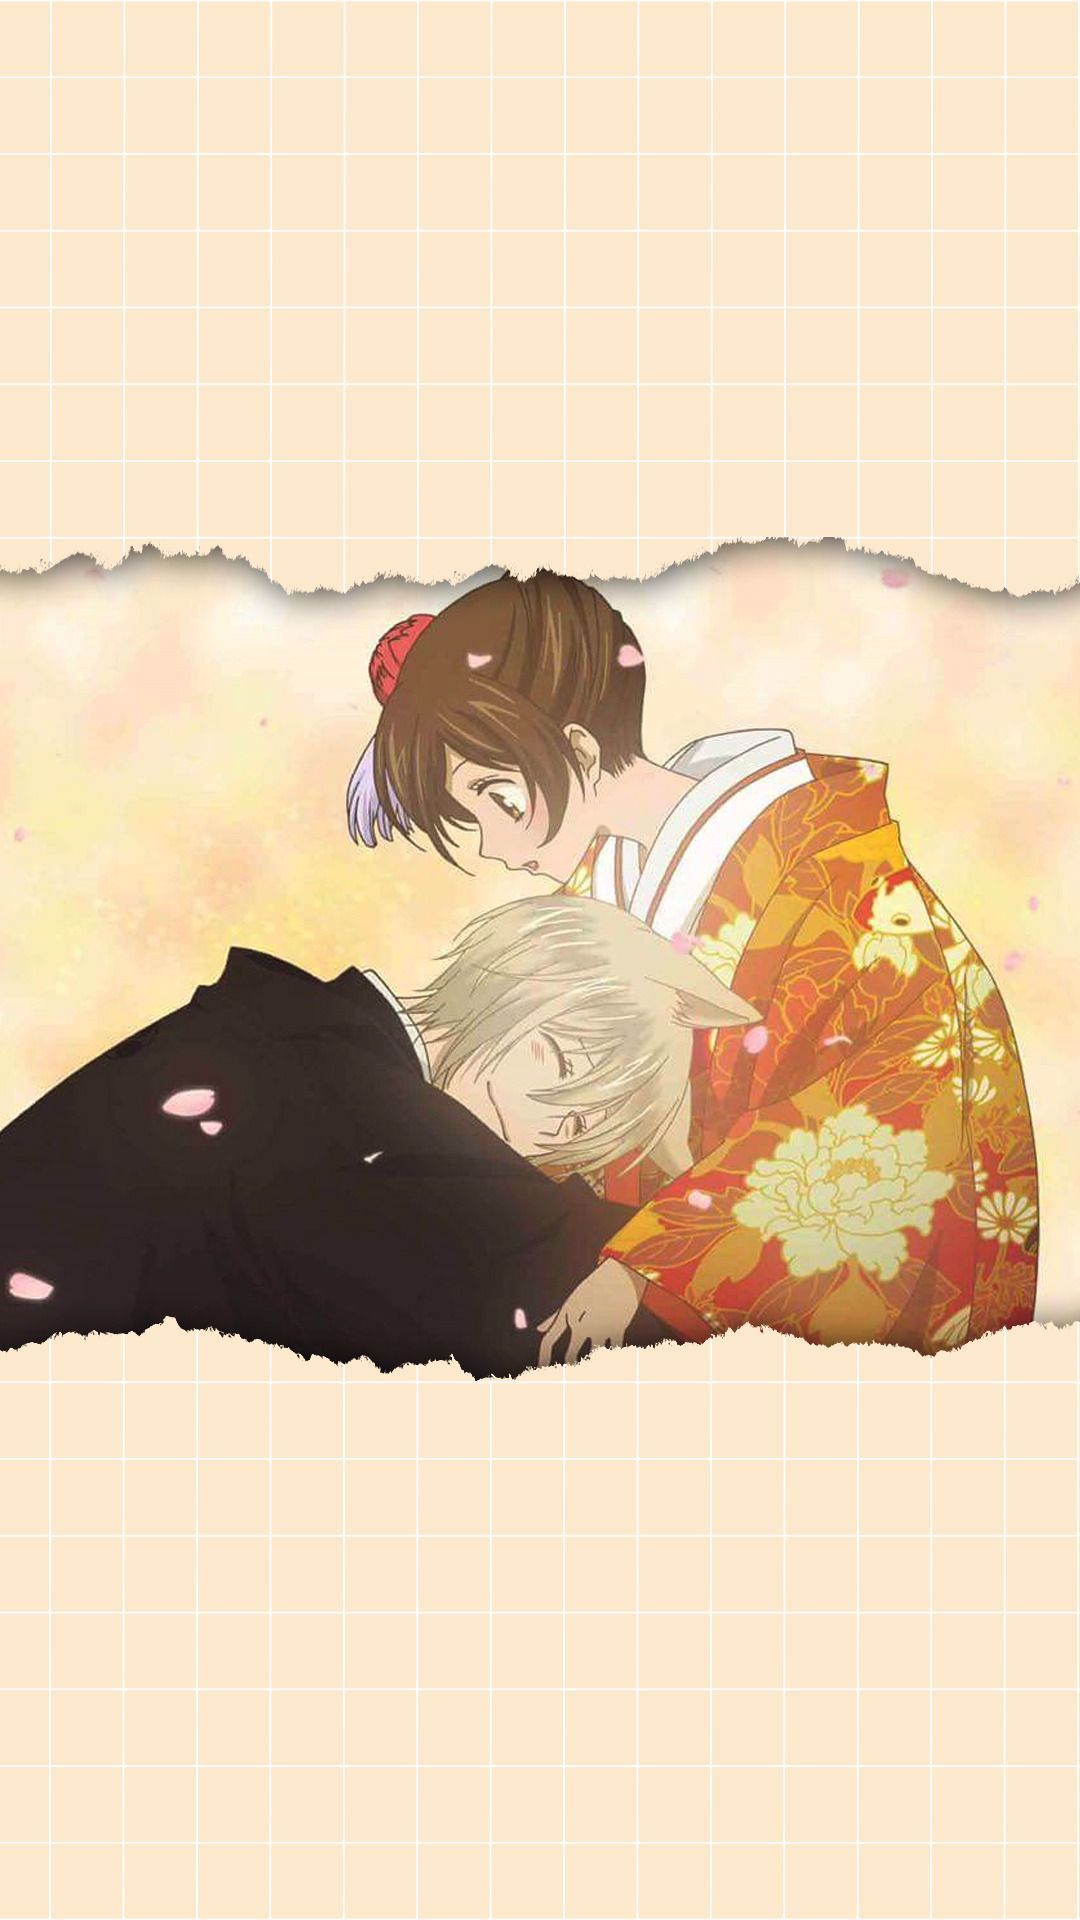 Wallpapers And Lockscreen Kamisama Hajimemashita If You Downloaded Rb Romantic Anime Anime Friendship Kamisama Kiss